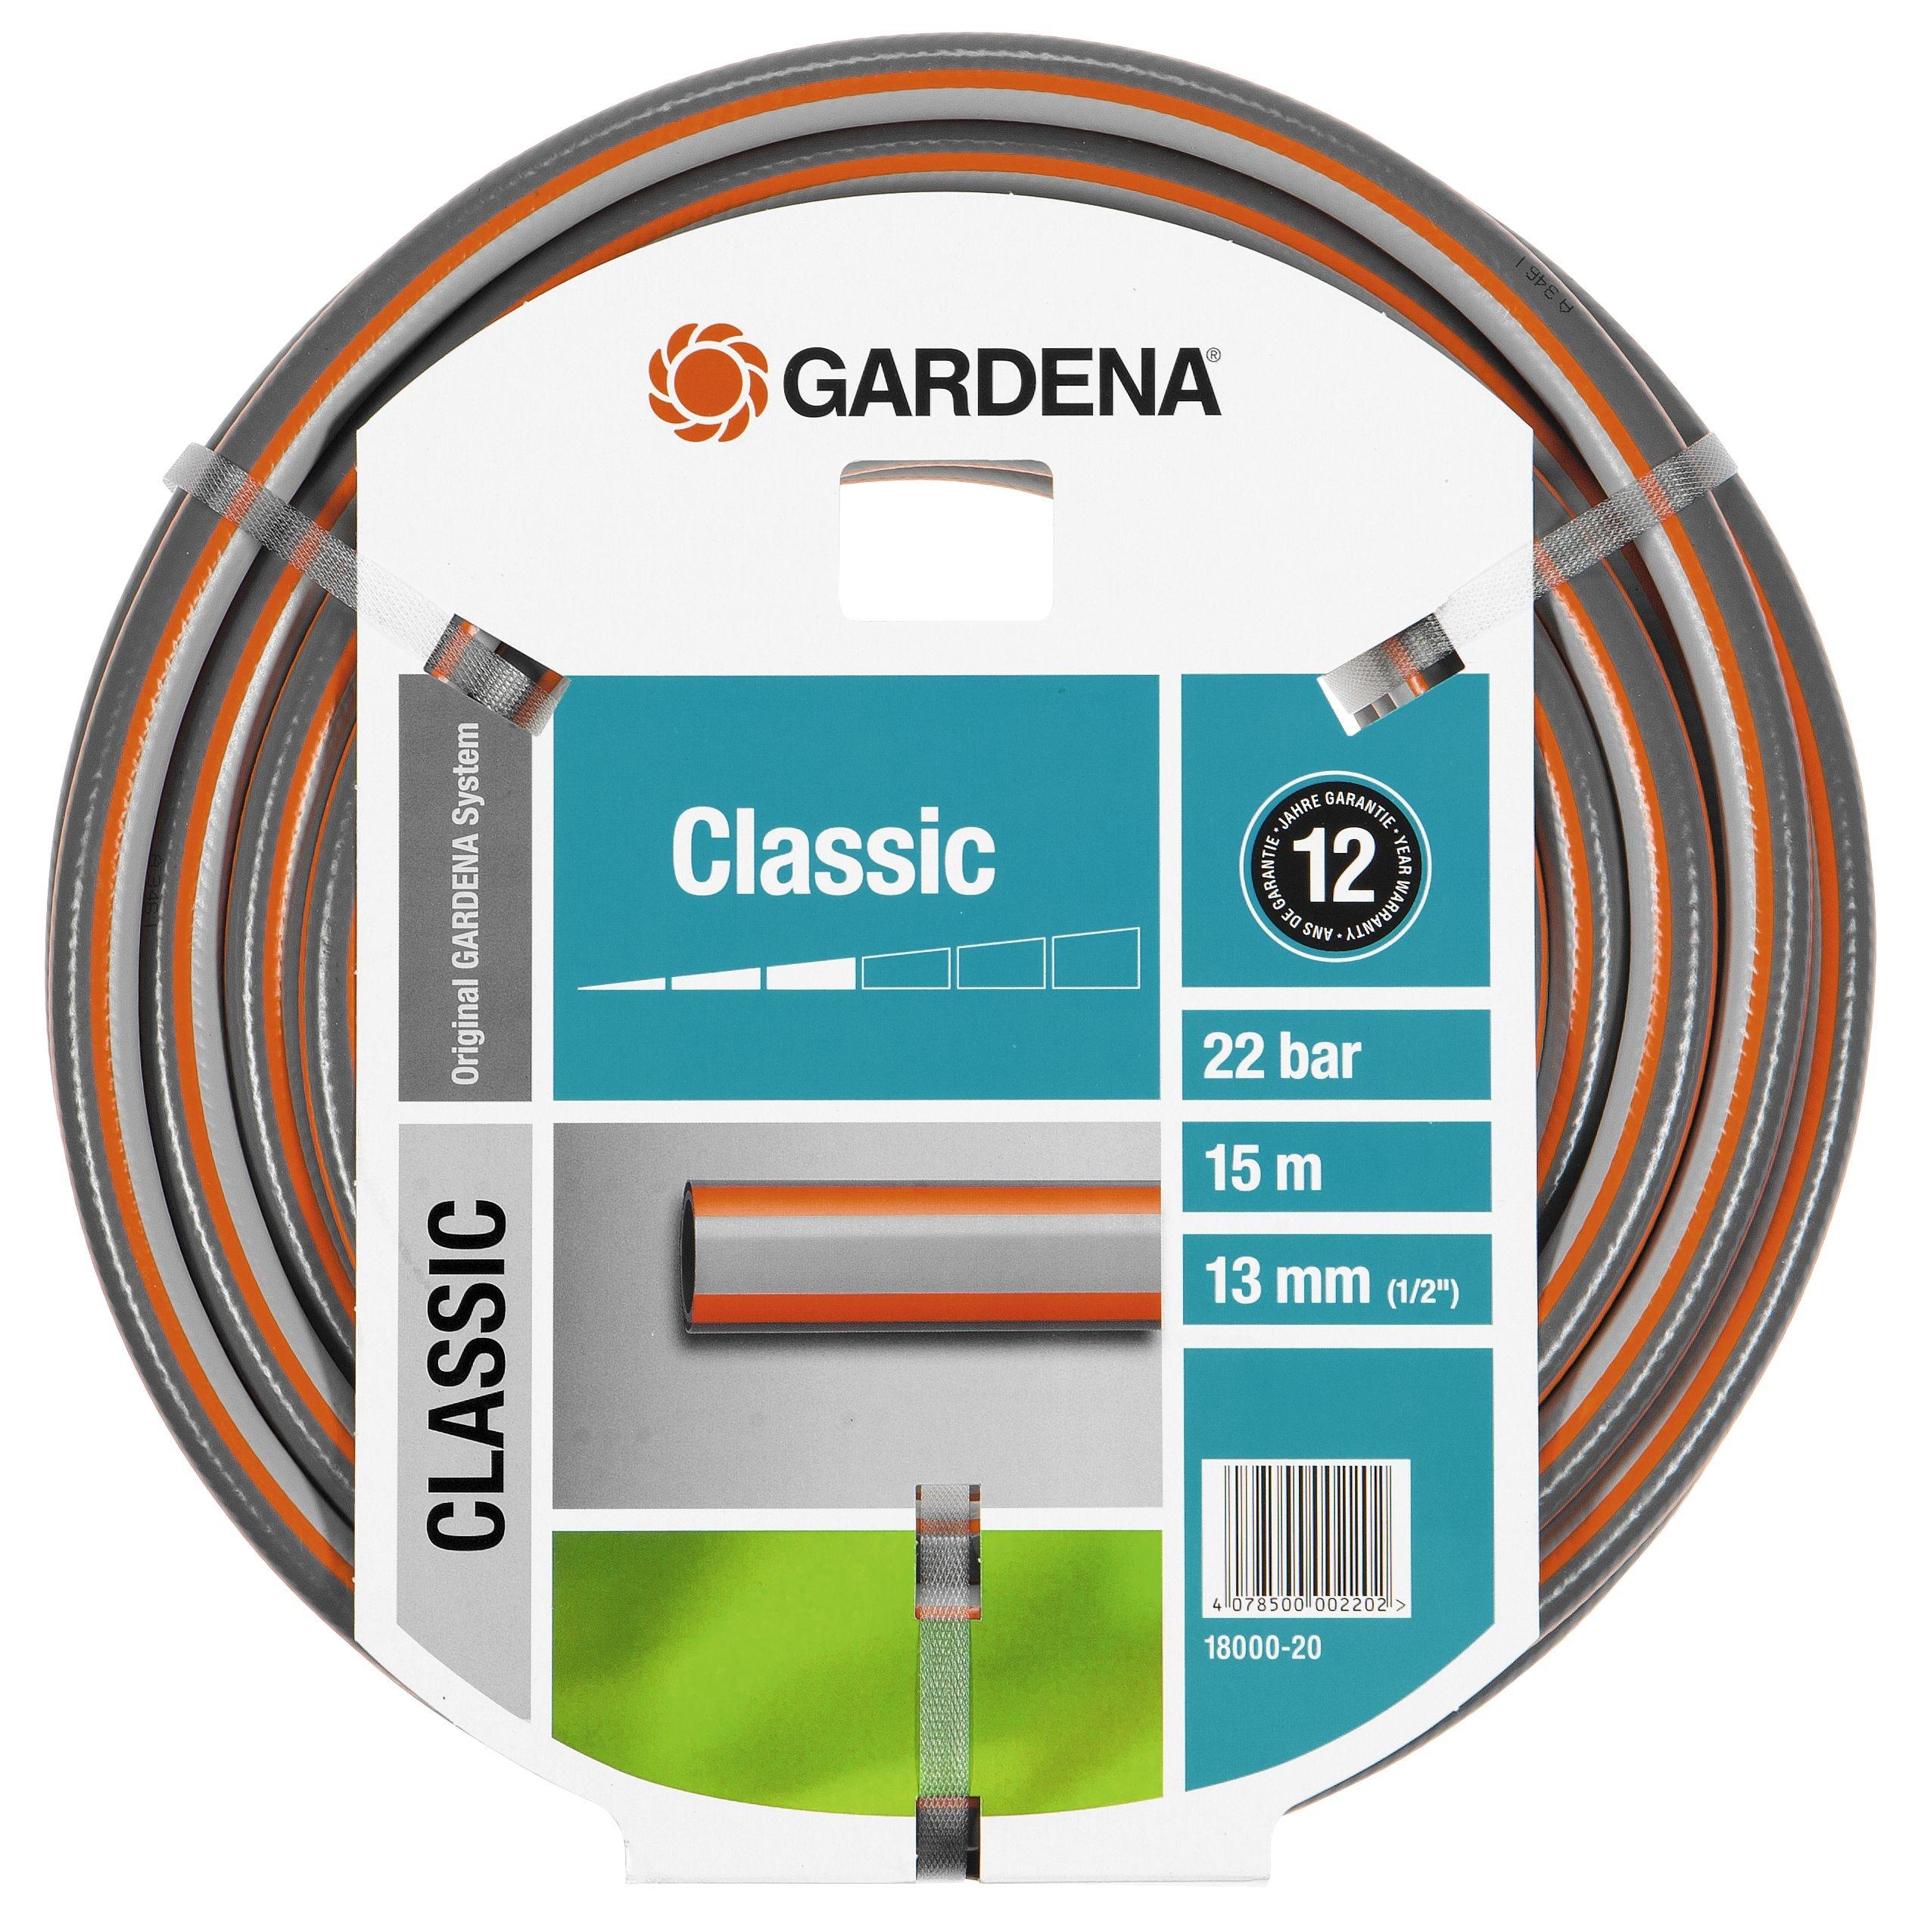 Gardena Tuinslang Classic Ø 13 mm 15 Meter